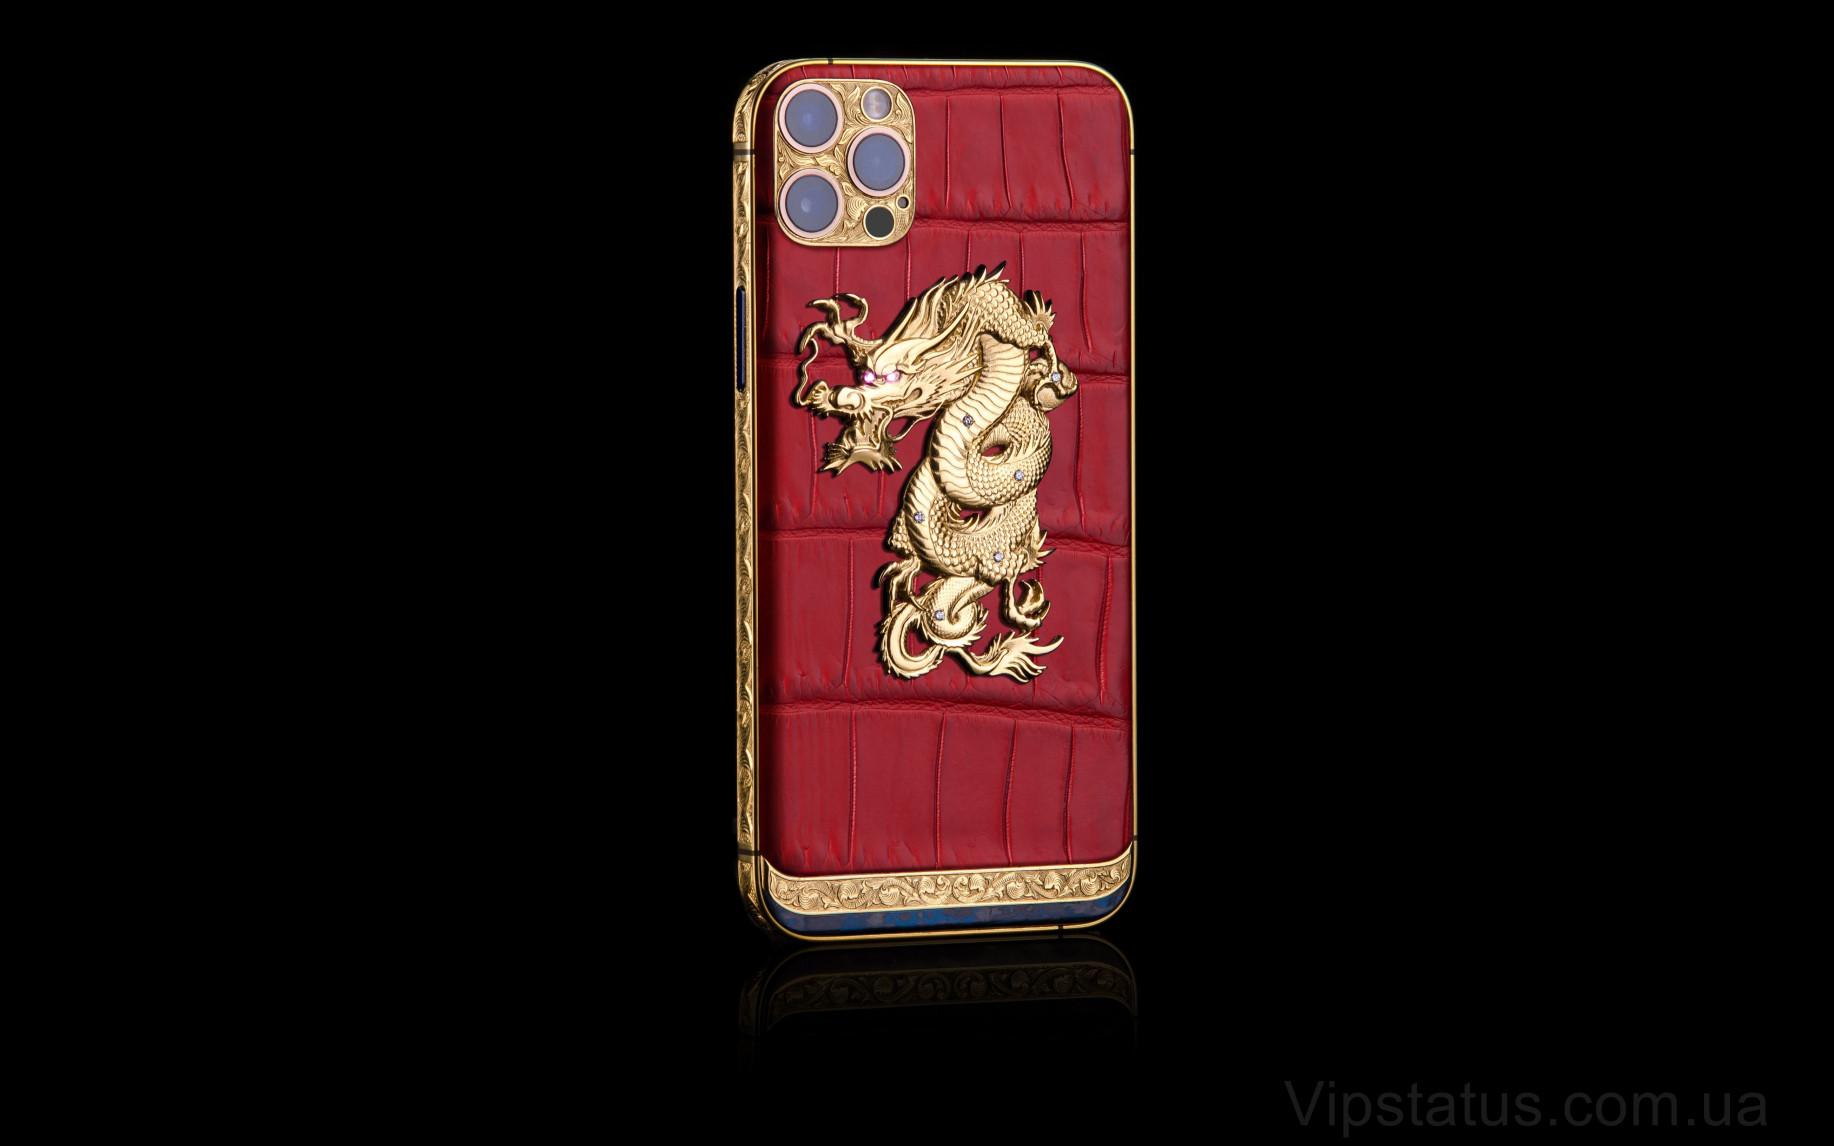 Elite Oriental Dragon IPHONE 12 PRO MAX 512 GB Oriental Dragon IPHONE 12 PRO MAX 512 GB image 11